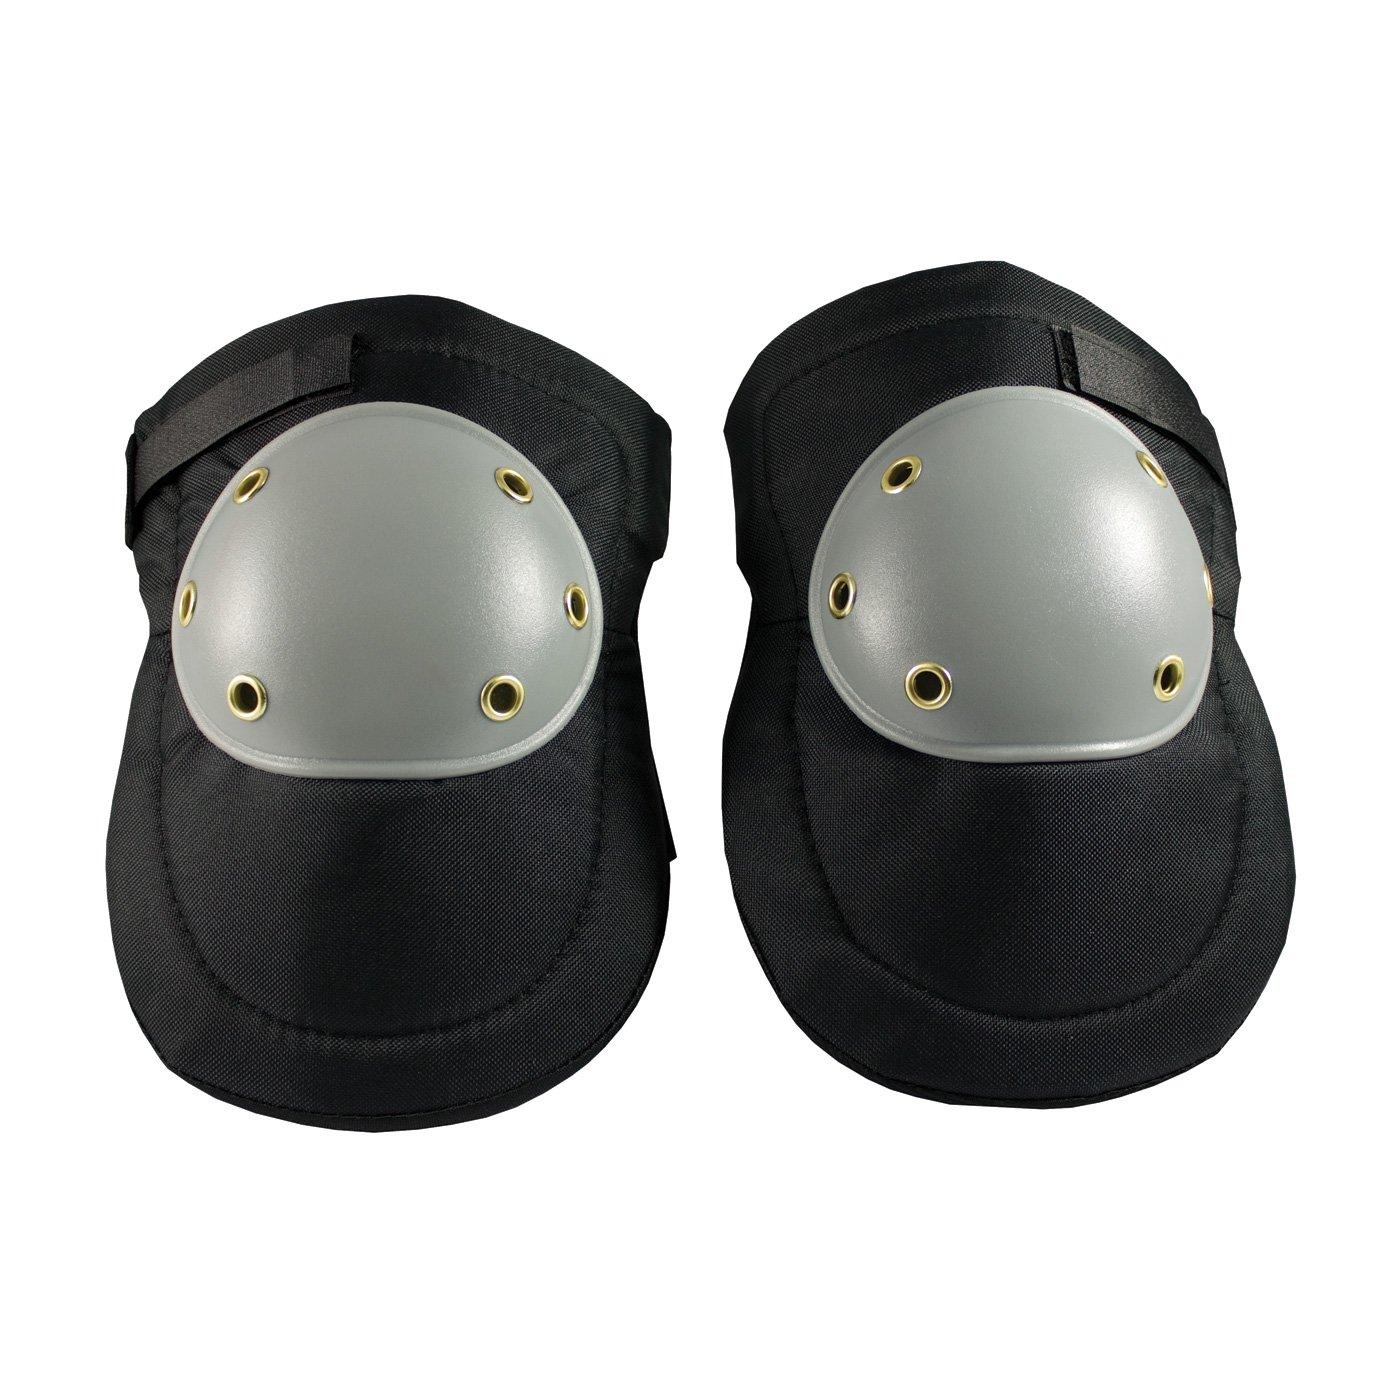 PIP 291-100 Hard Plastic Cap Knee Pads, Large, Black